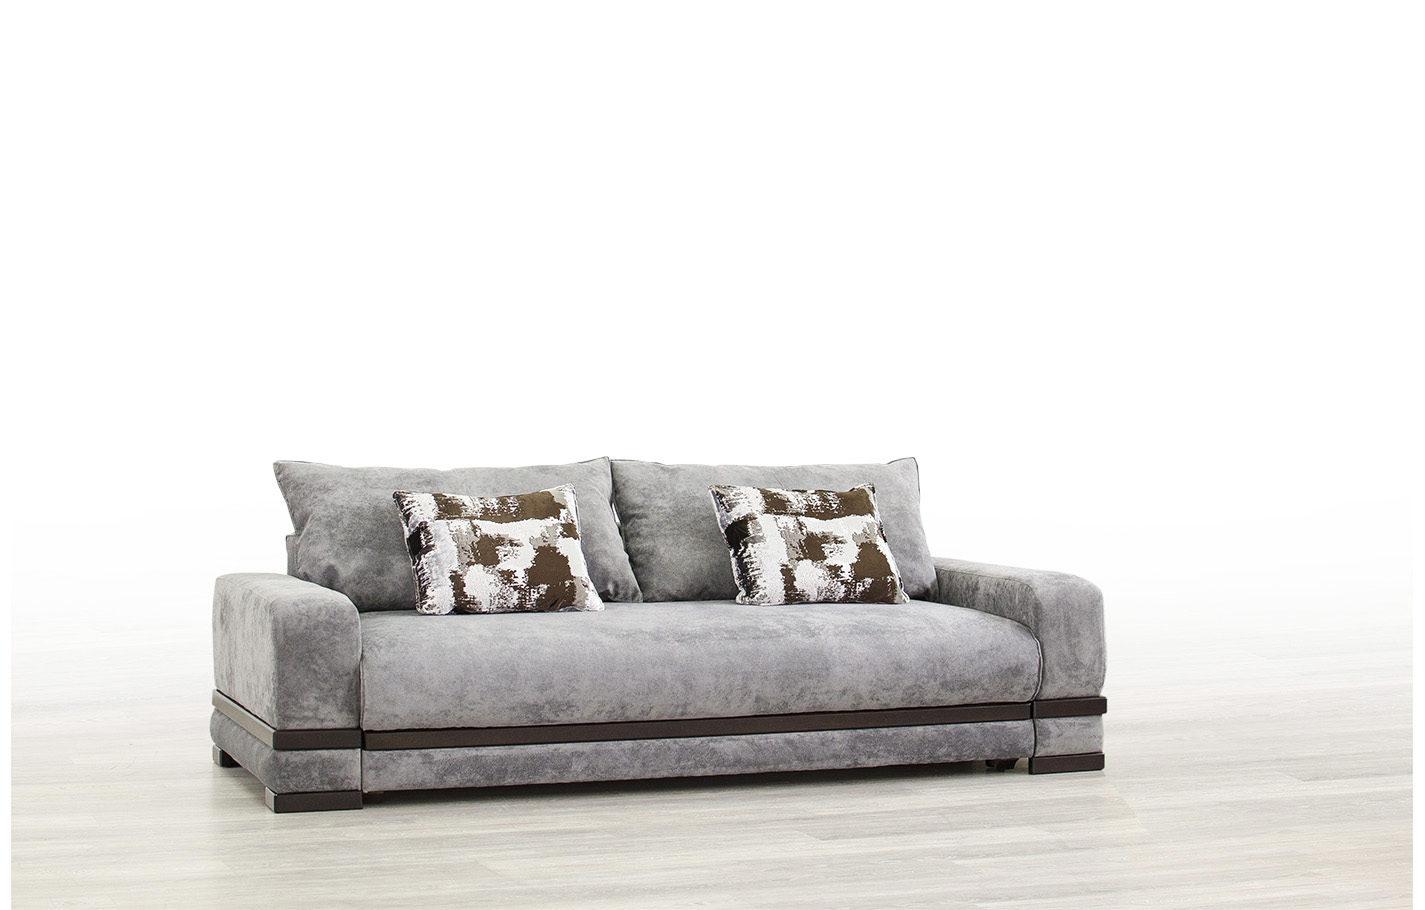 sofa_komfort_3-e1540995293874